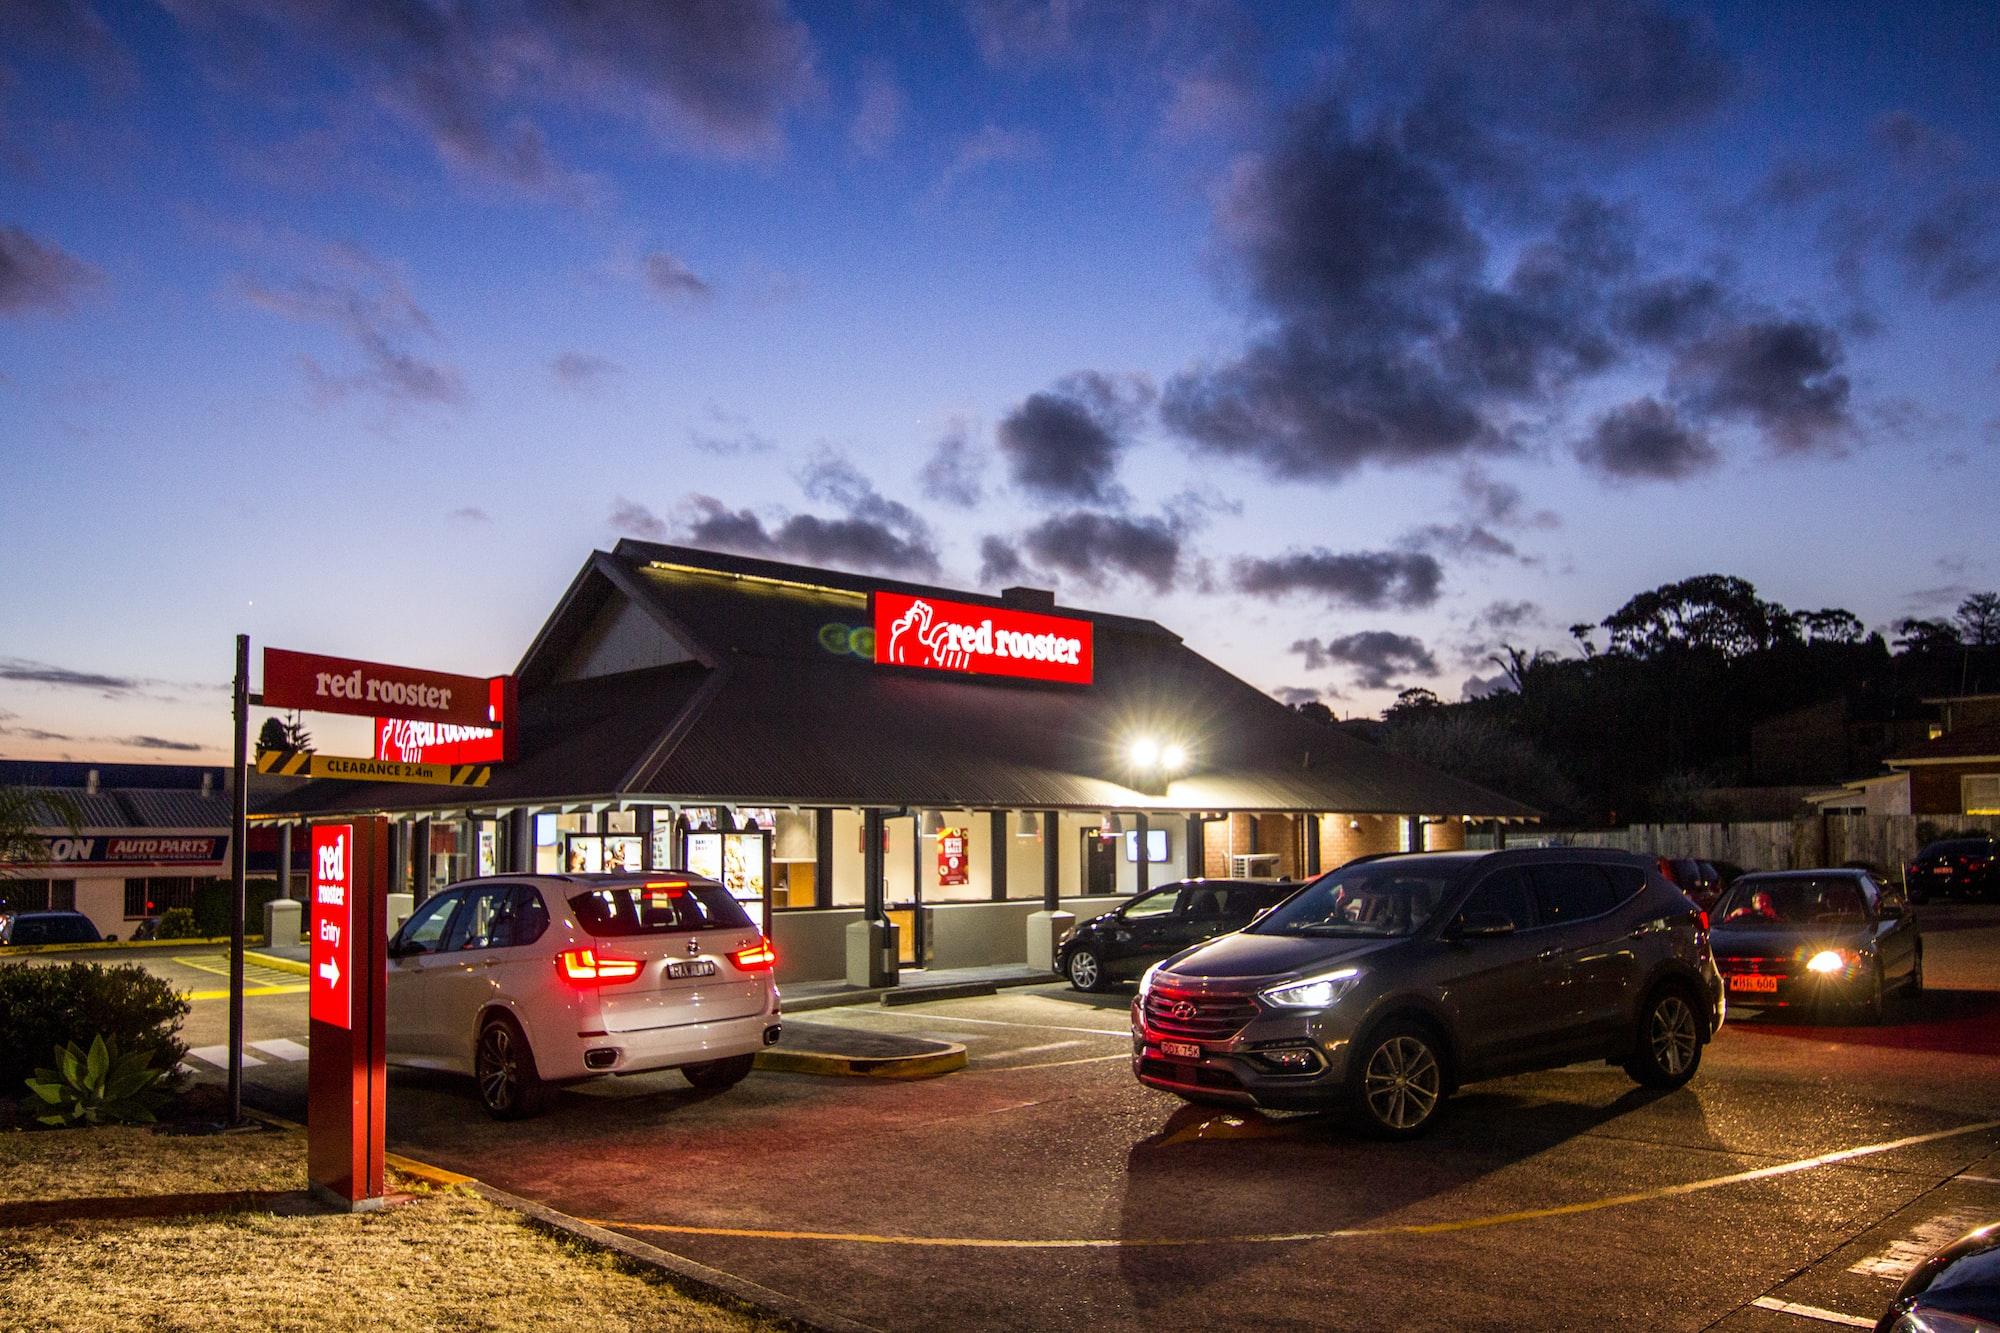 Red rooster, drive-thru, Carlton, NSW